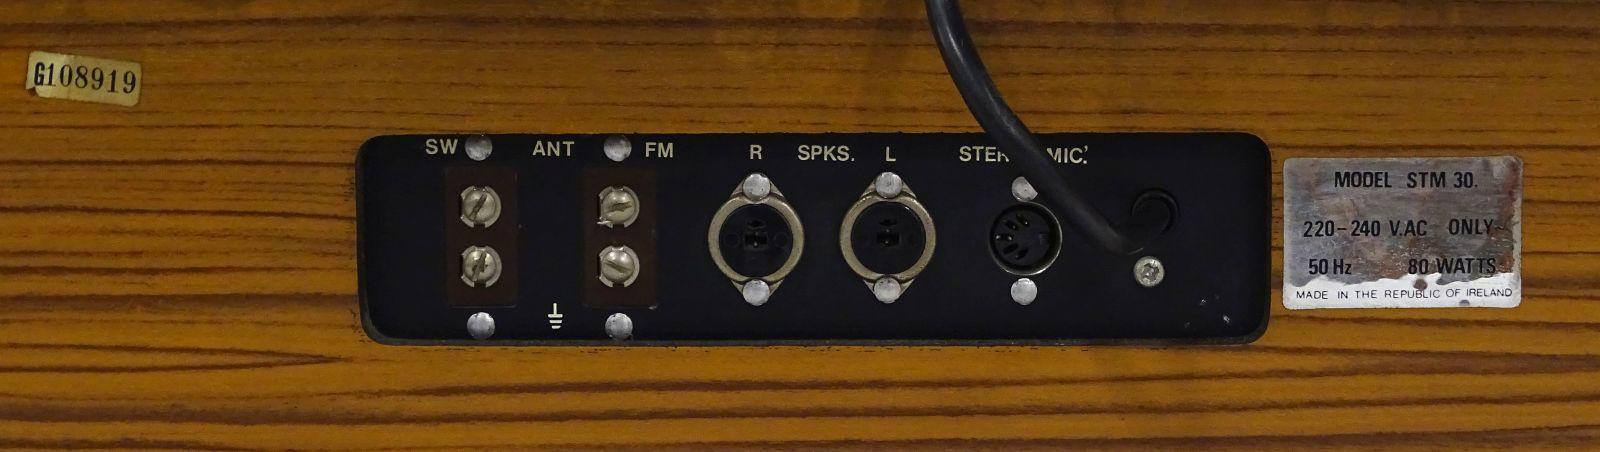 DSC06988.JPG (1600×452)